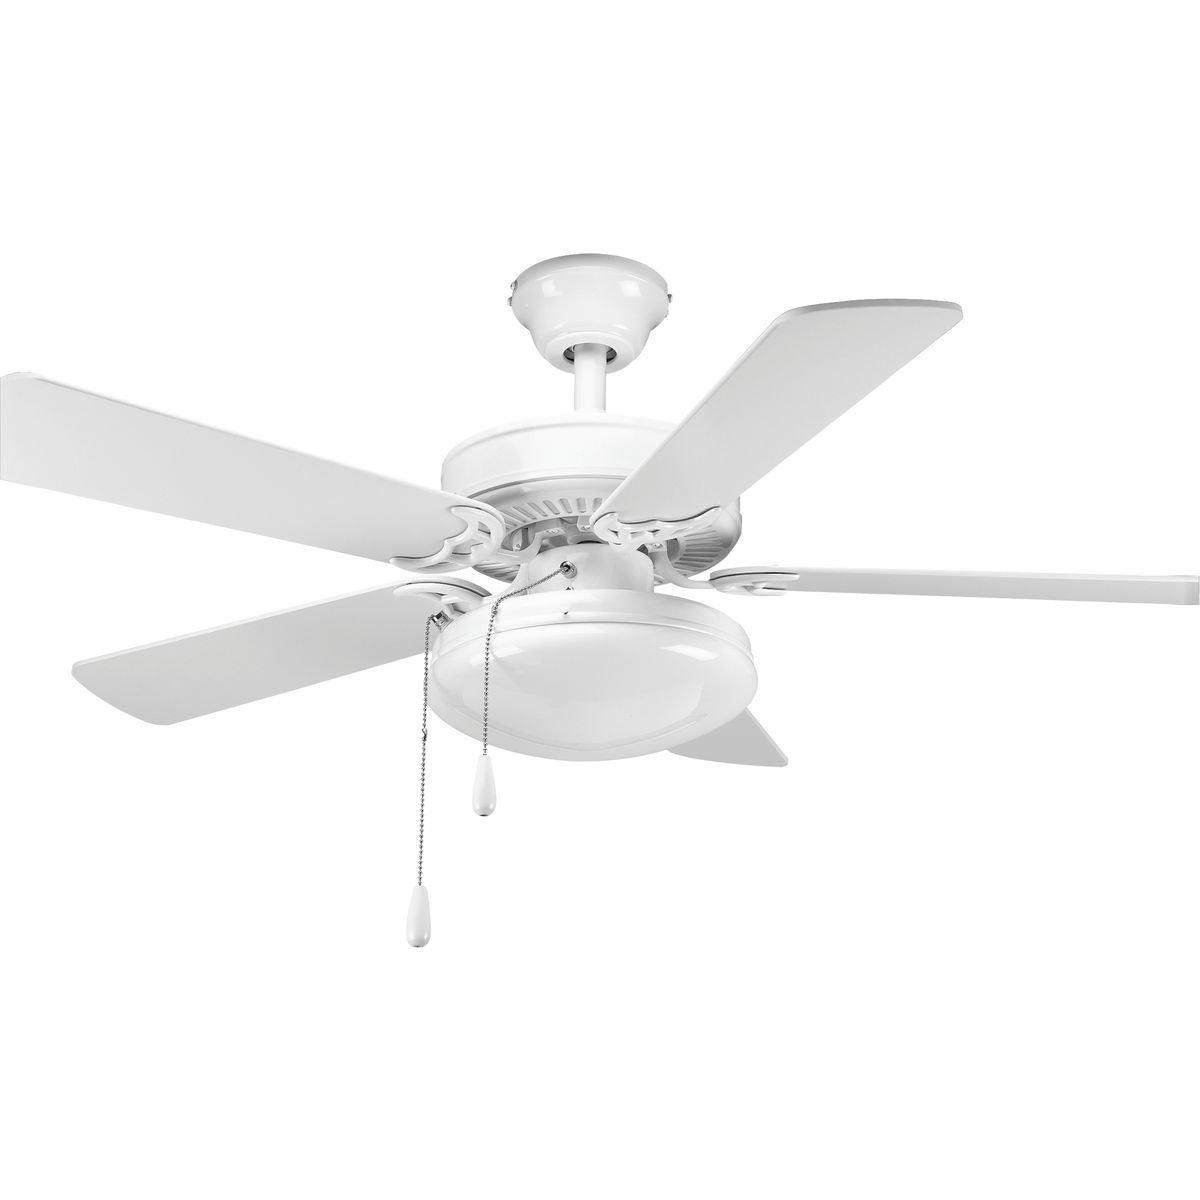 "Cerro 5 Blade Ceiling Fans Inside Most Recent 42"" Goreville 5 Blade Ceiling Fan (View 11 of 20)"